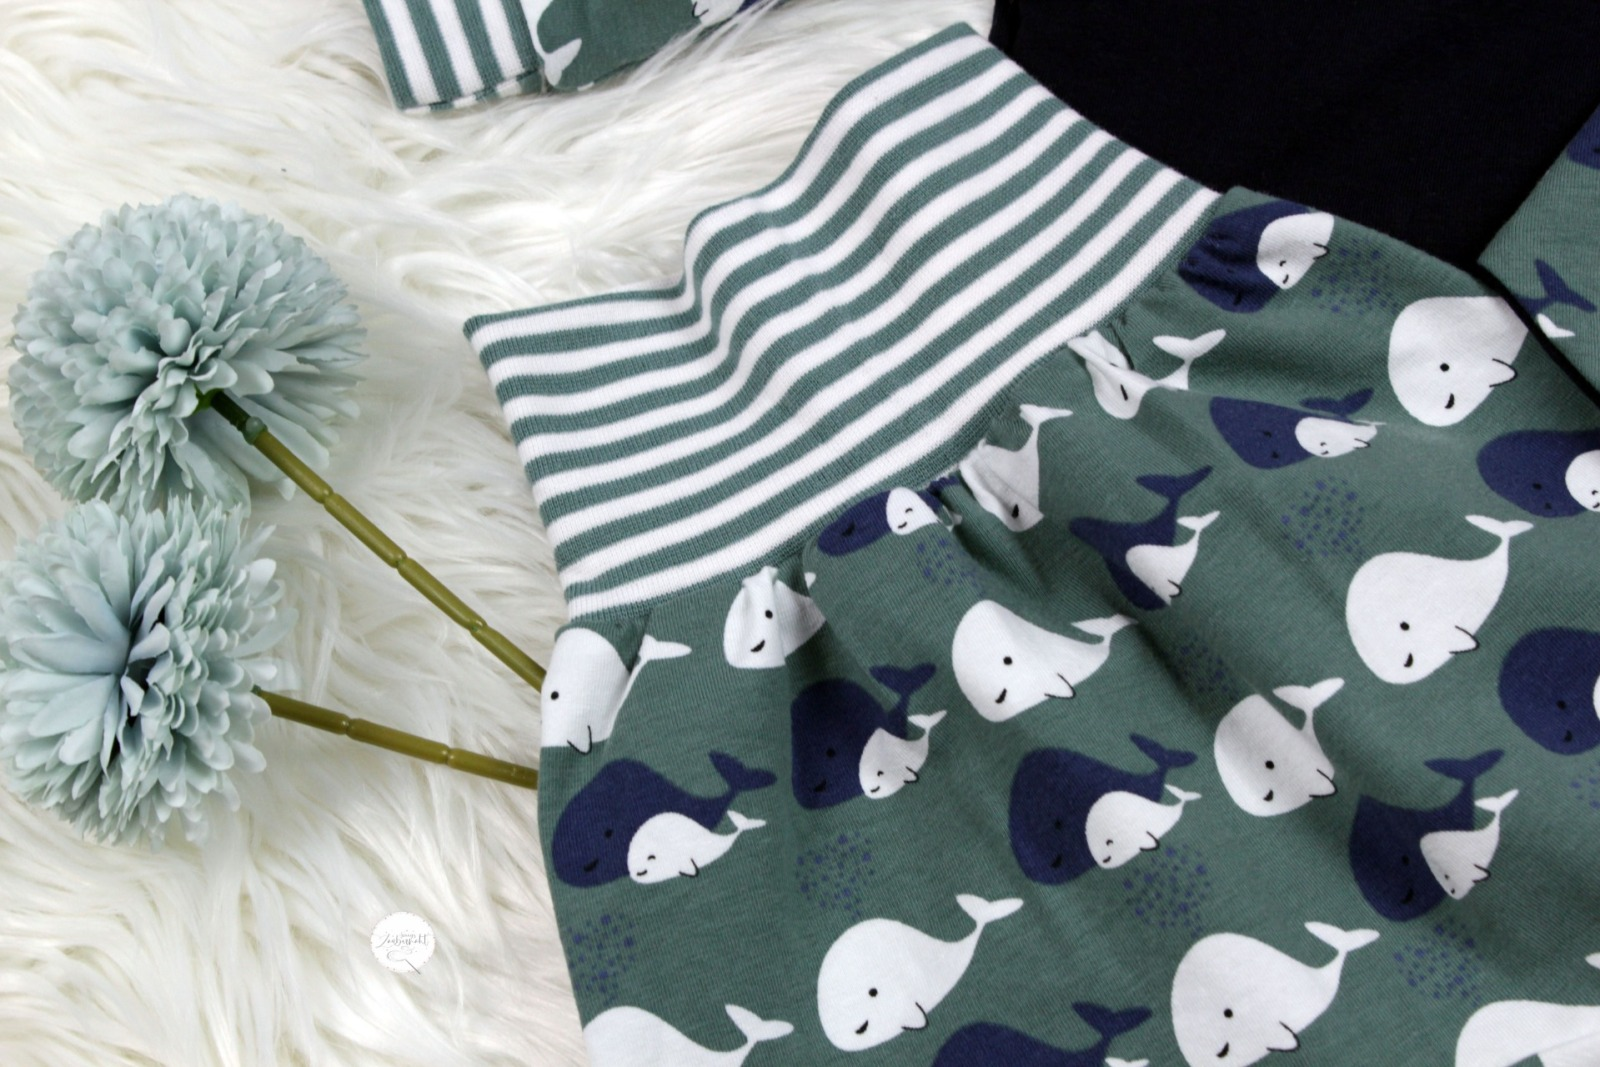 Sofortkauf Handmade Set Pumphose Shirt Halstuch